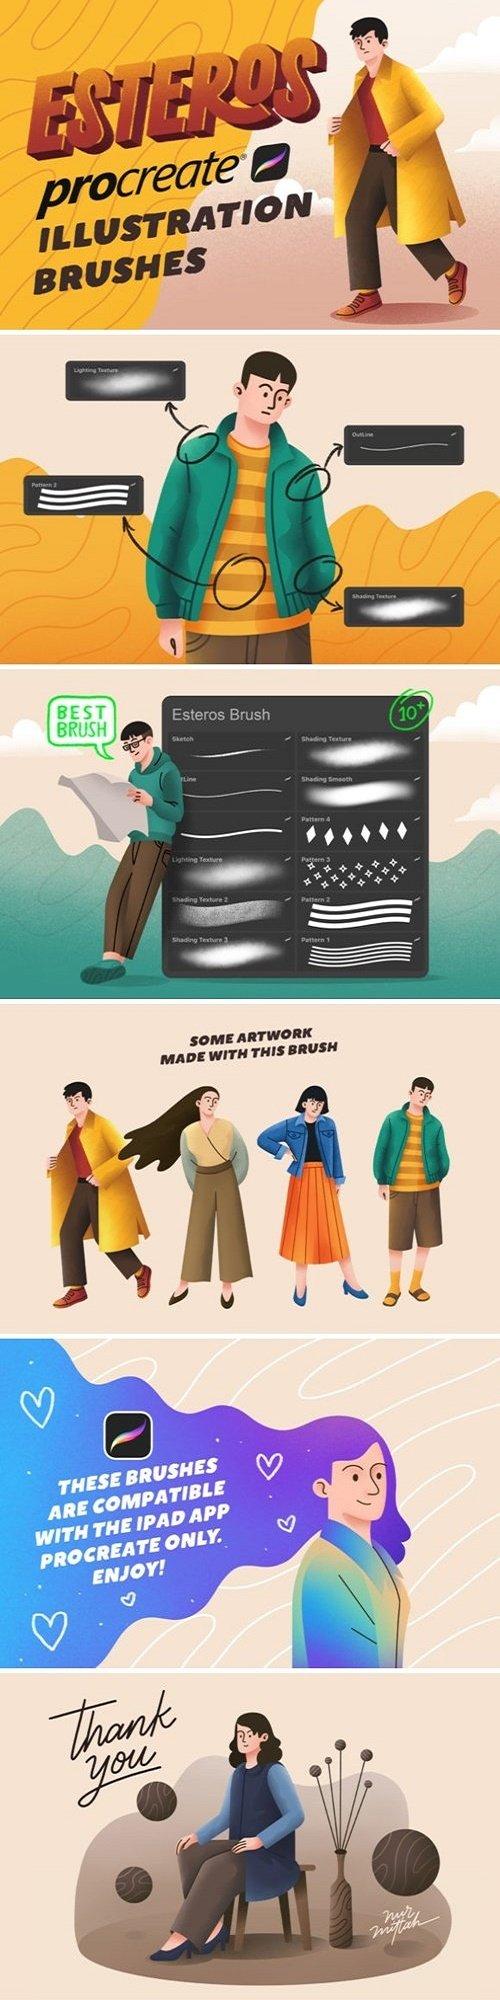 Esteros Procreate Illustration Brushes - 4138290